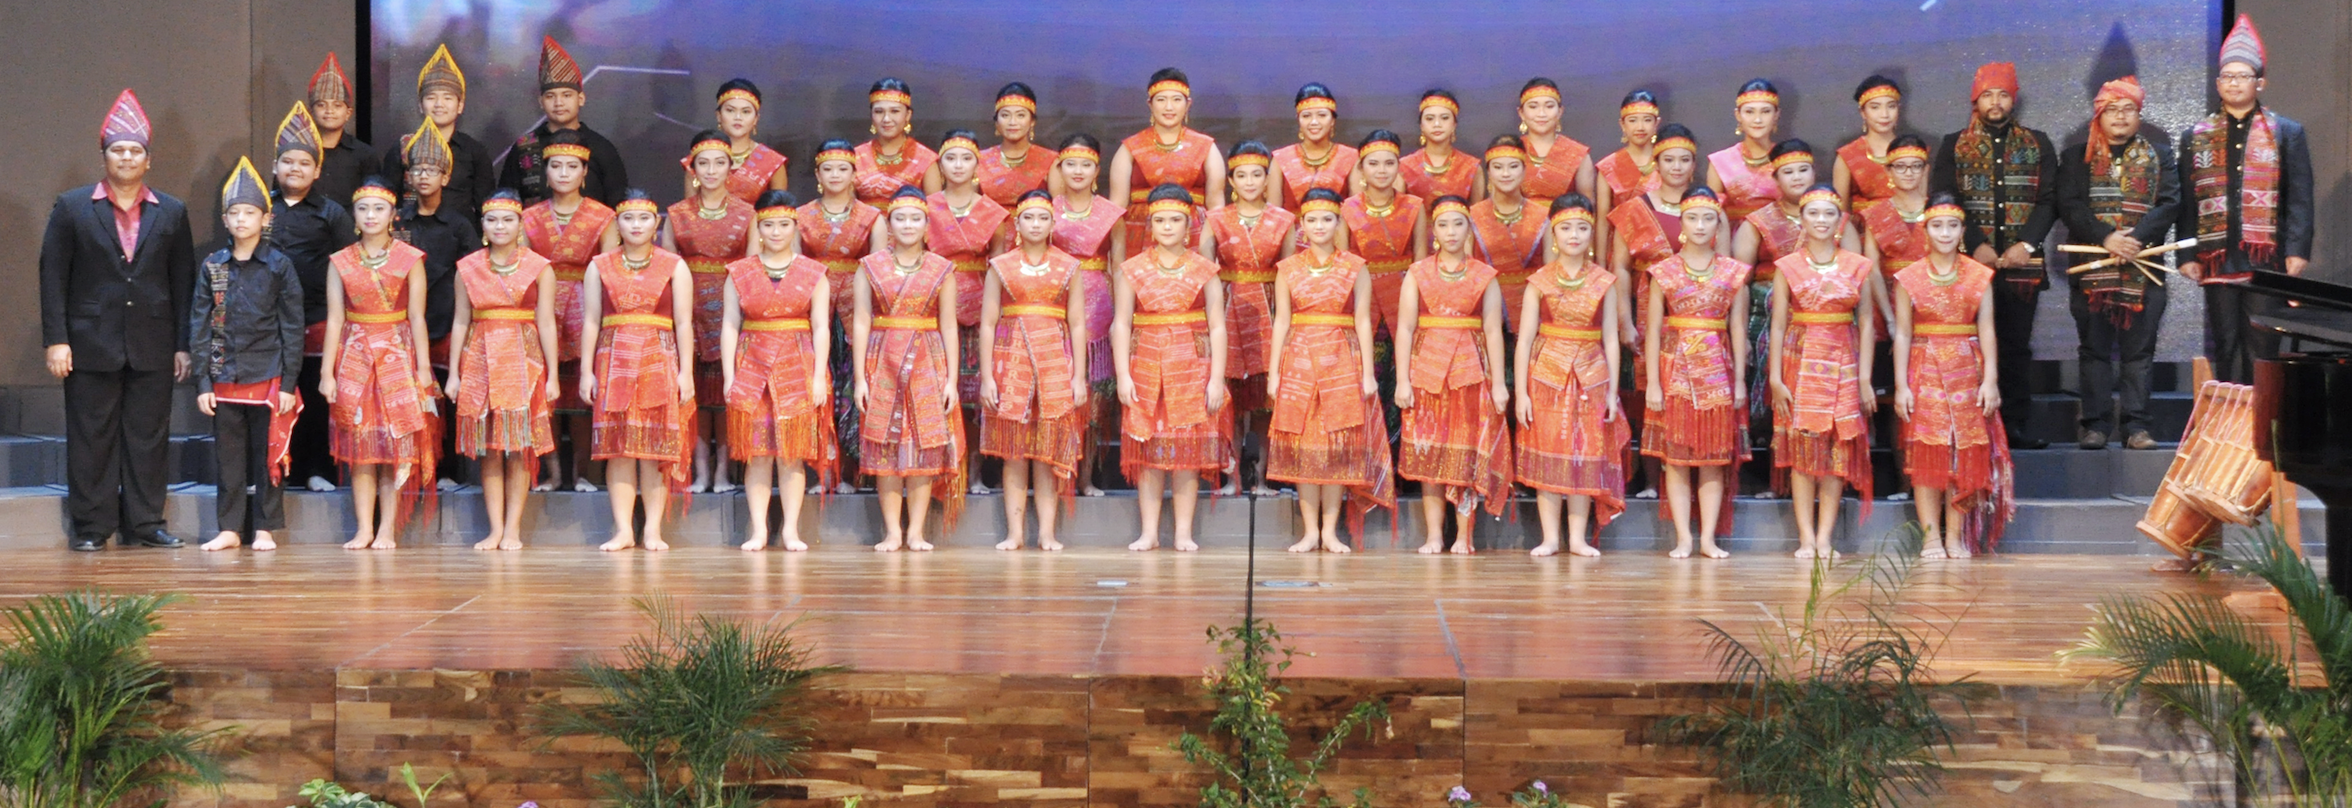 Melody Spekta Choir